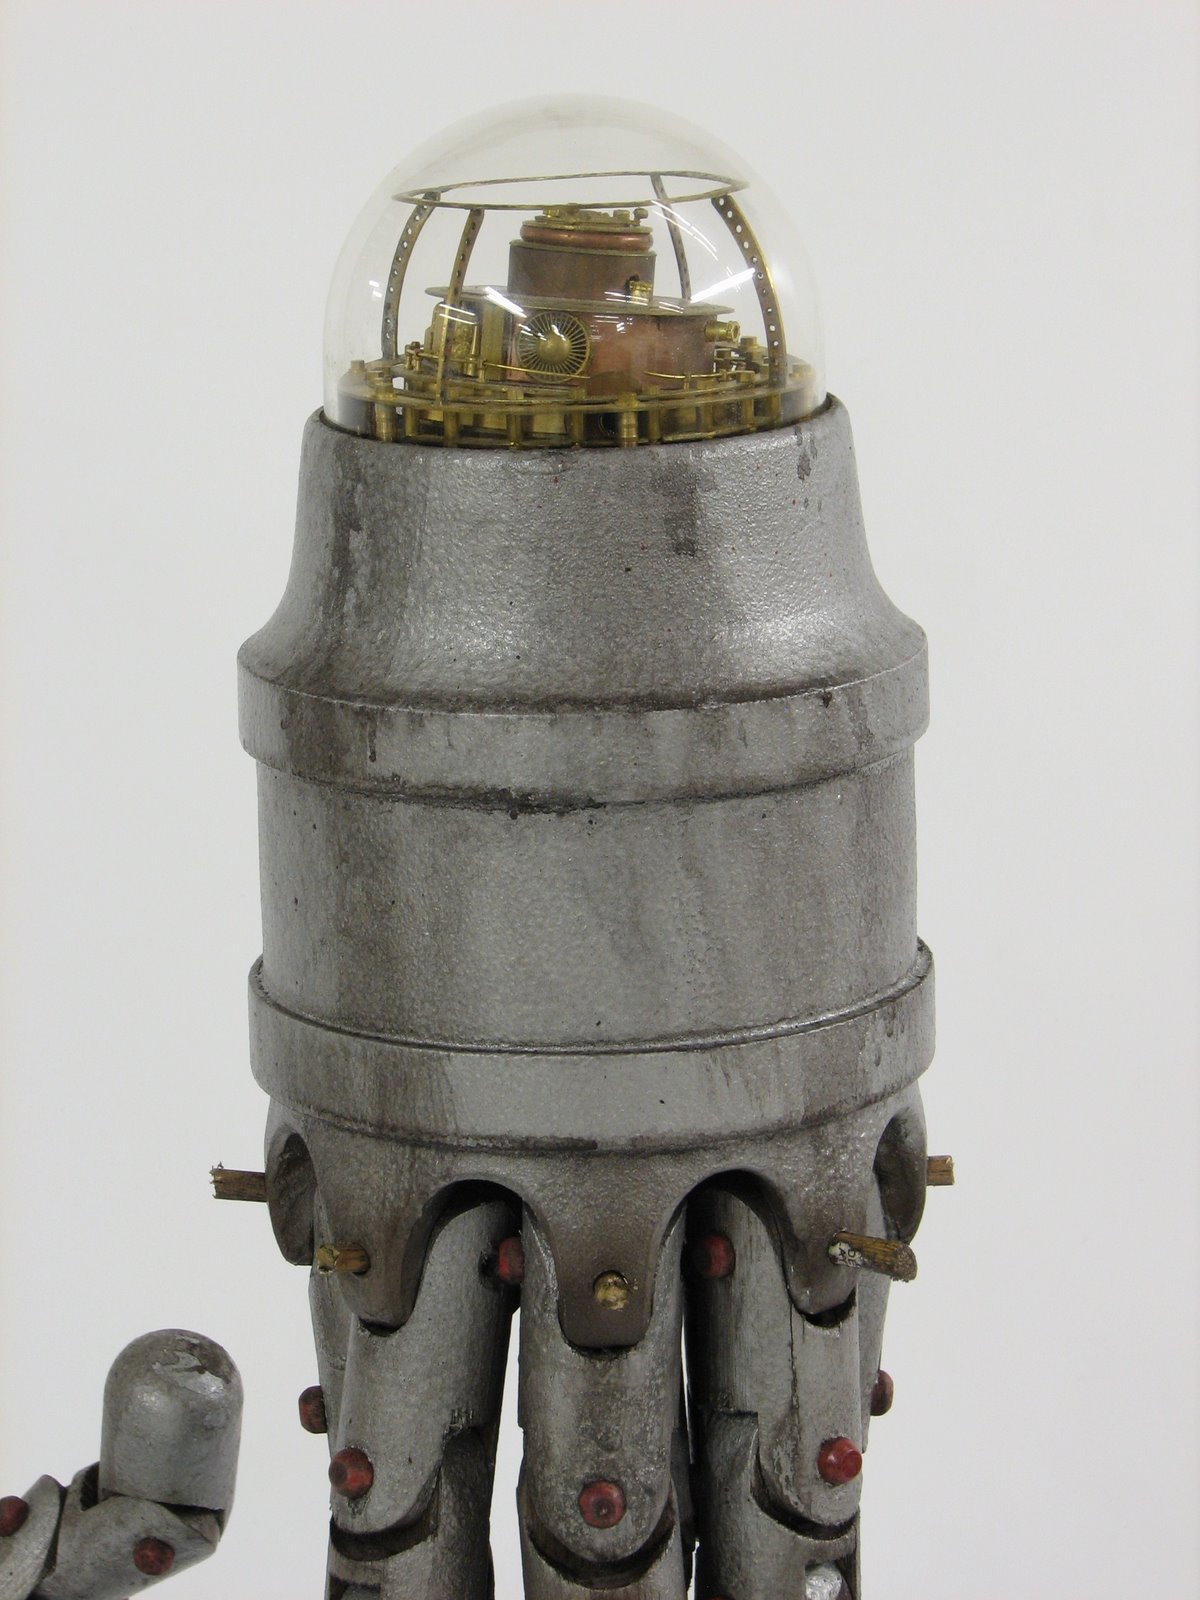 colin johnson octobot2 detail